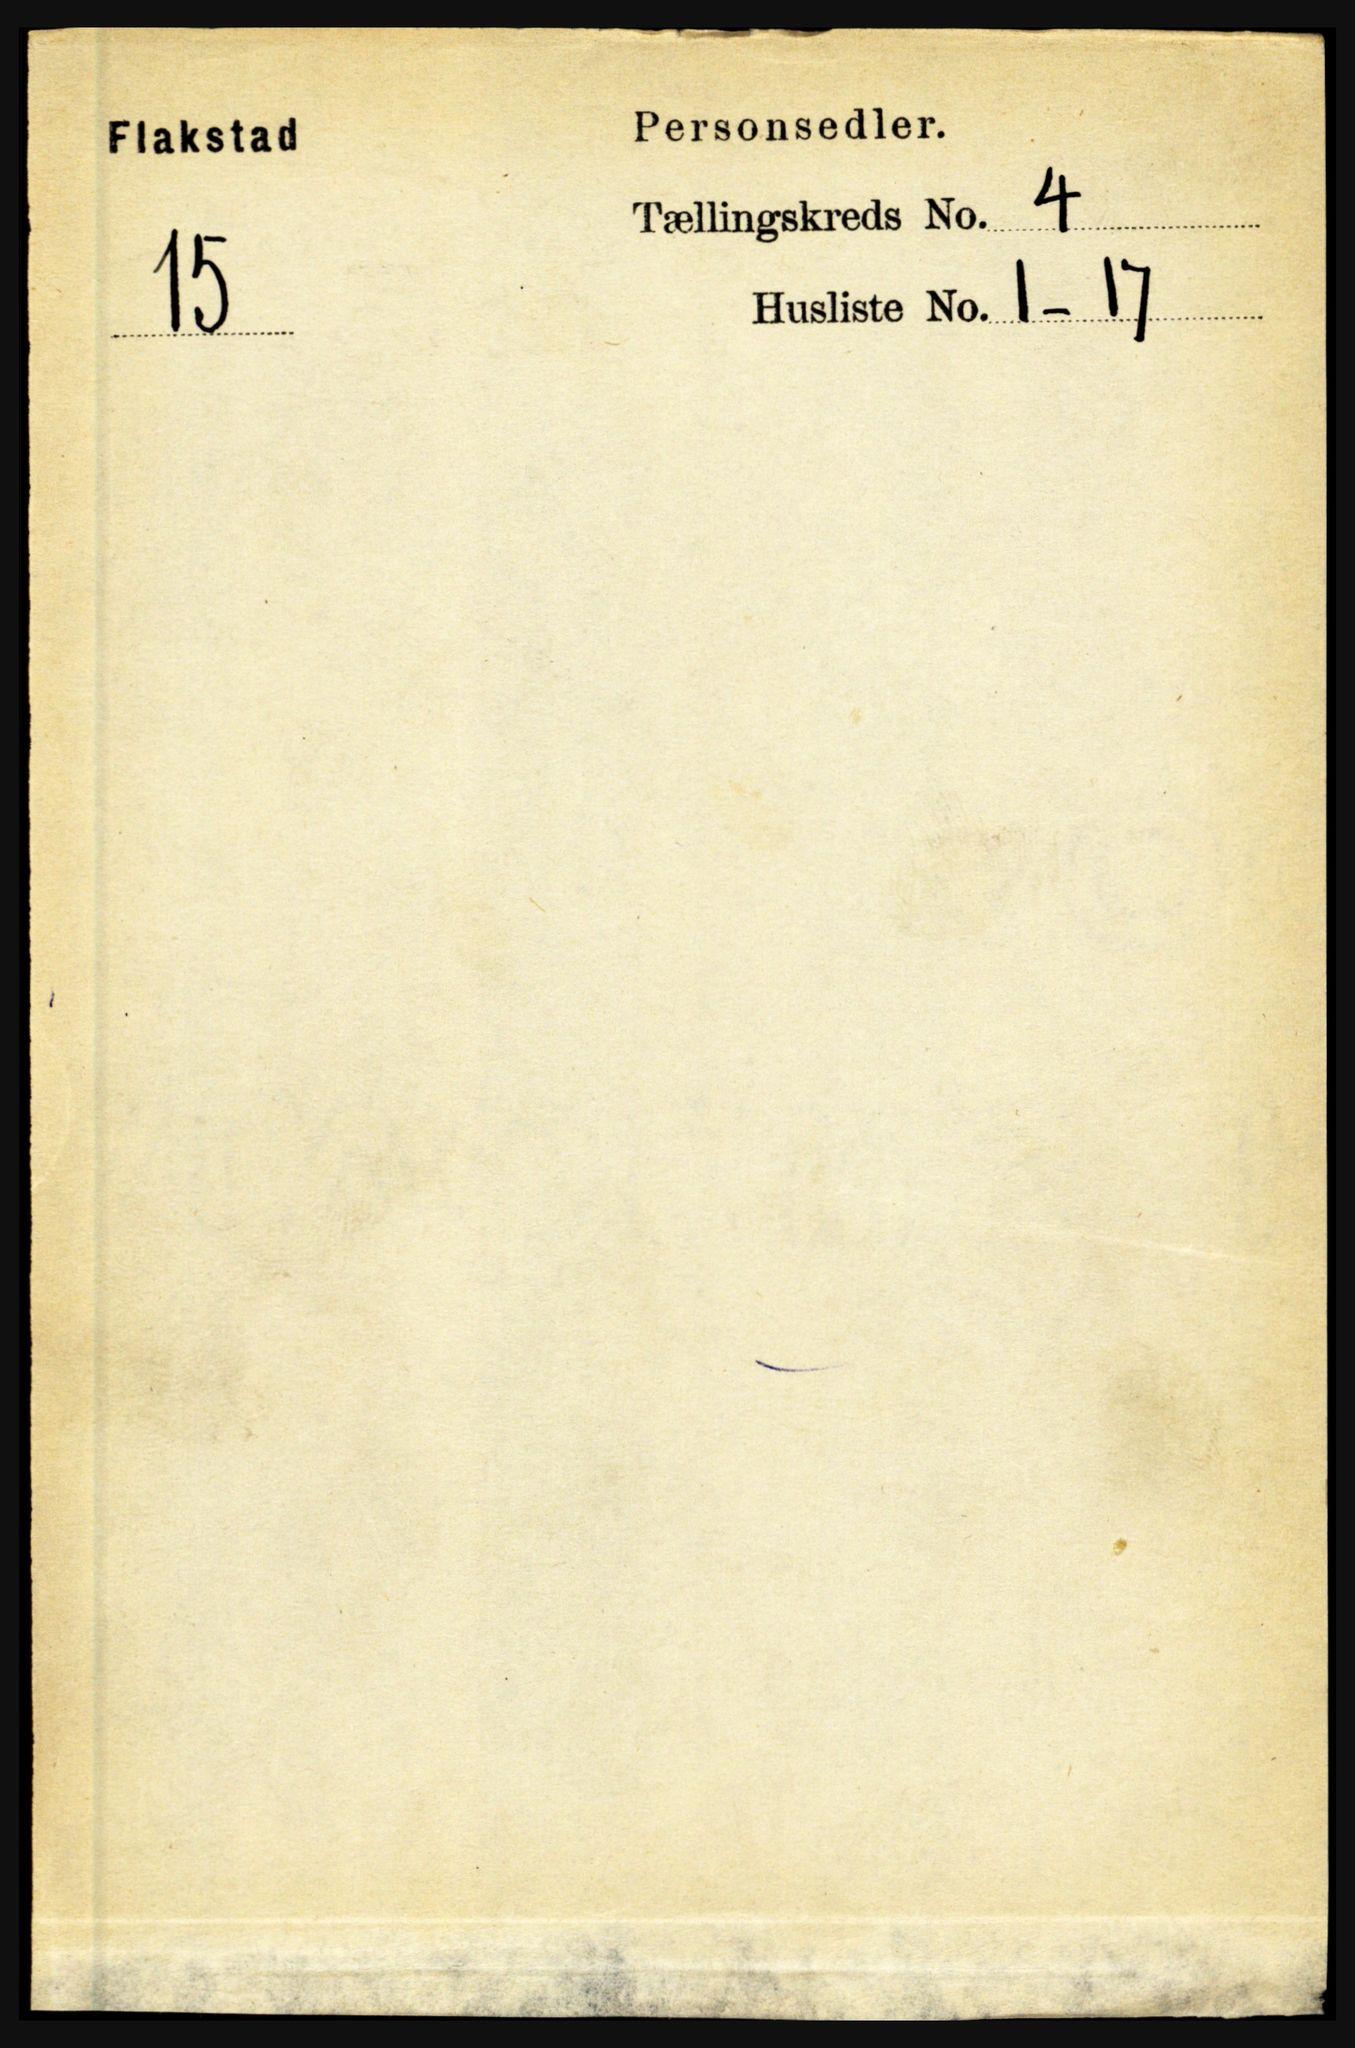 RA, Folketelling 1891 for 1859 Flakstad herred, 1891, s. 1860